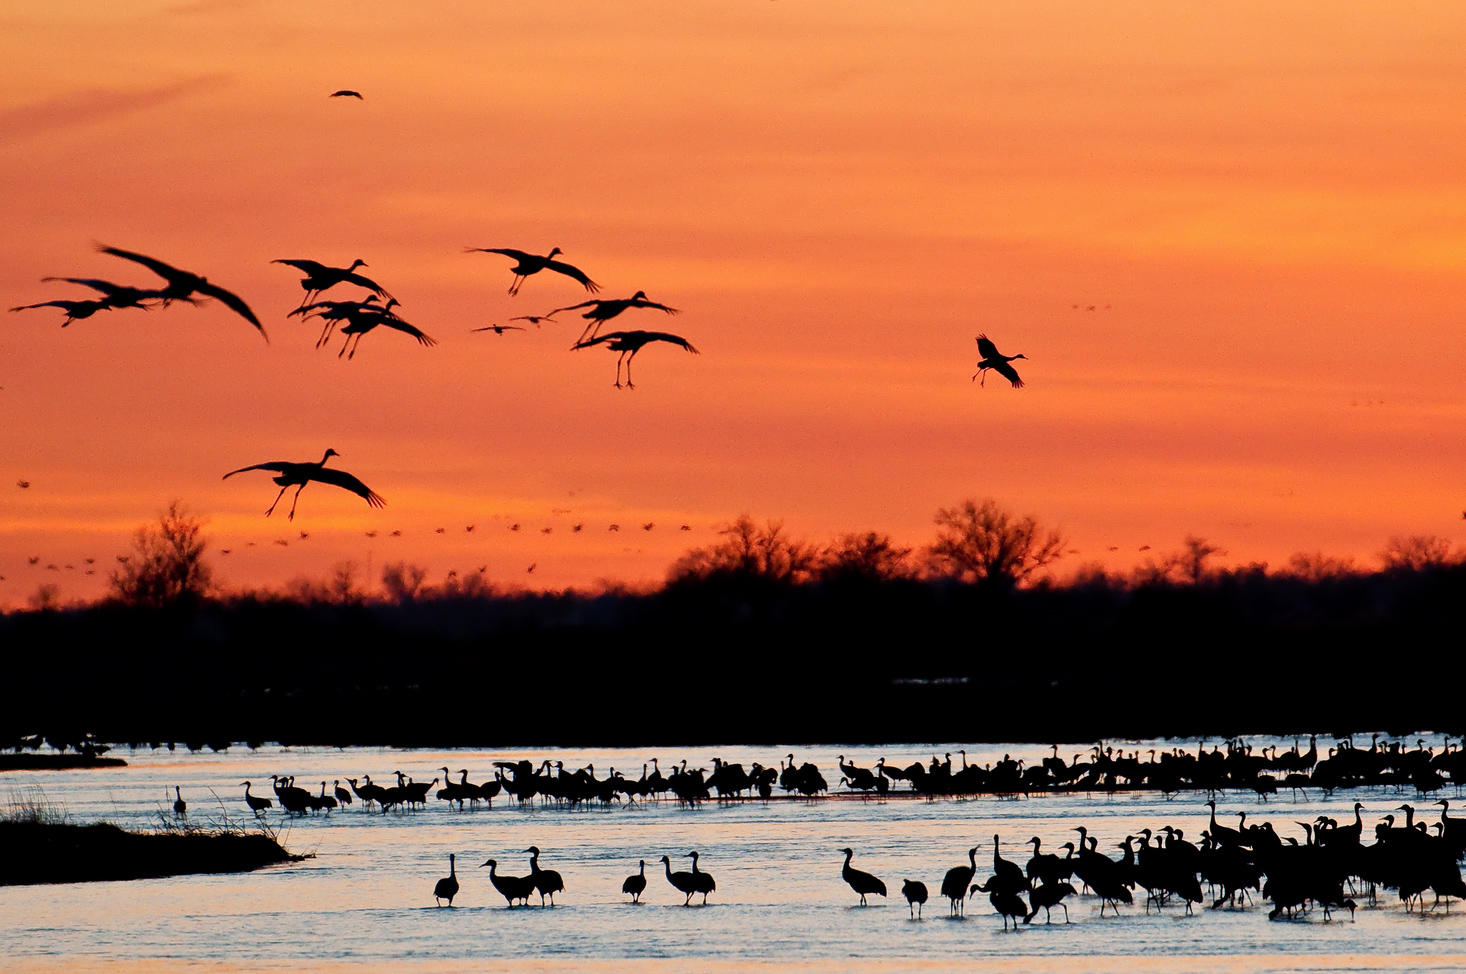 Sandhill Cranes at Dusk. Rowe Sanctuary, Nebraska. Don Brockmeier